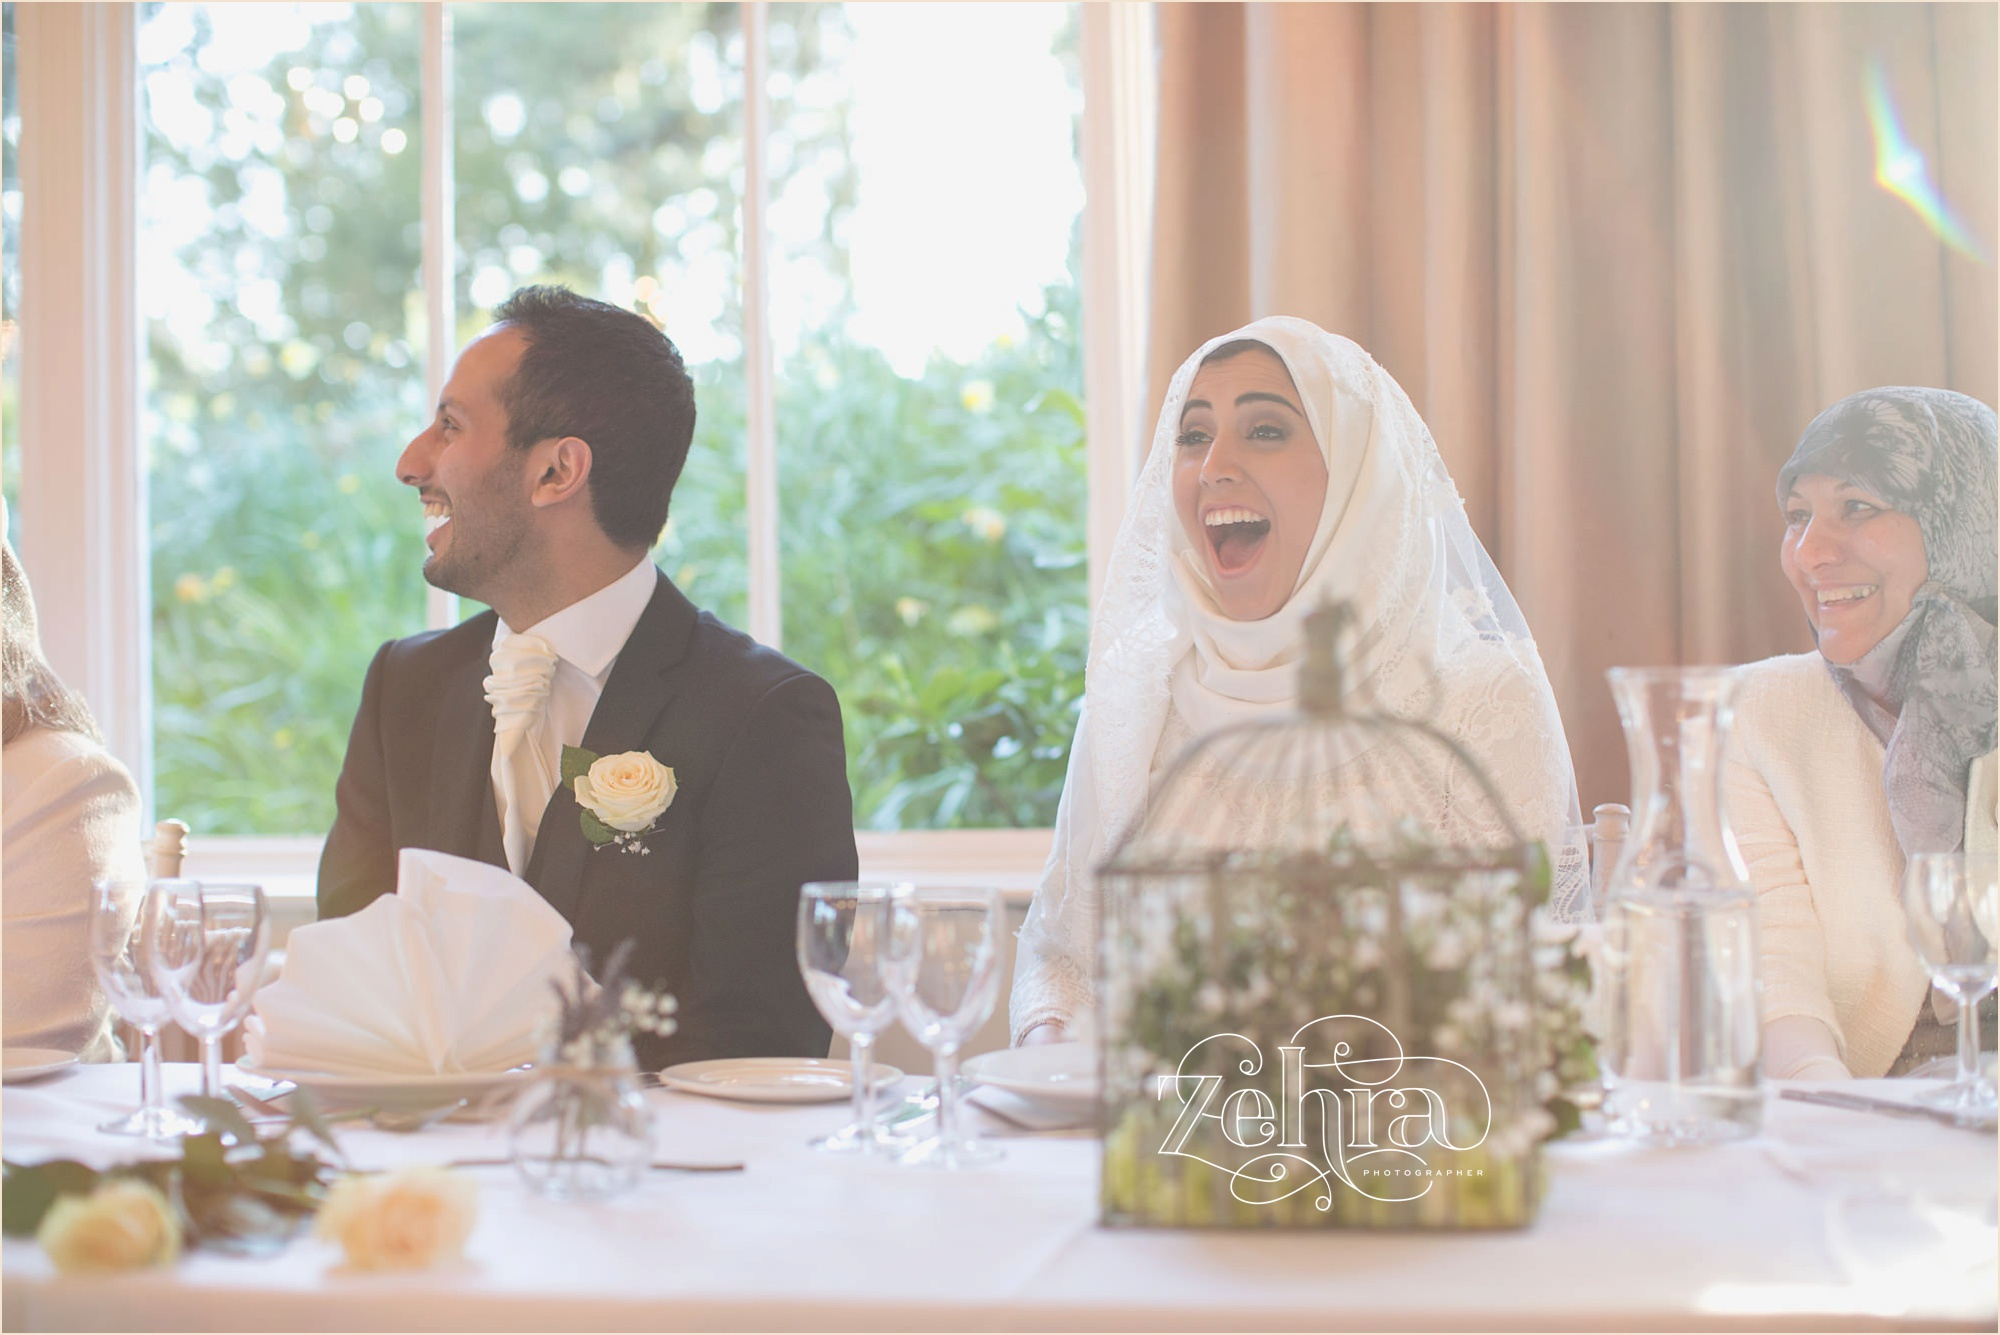 jasira manchester wedding photographer_0111.jpg